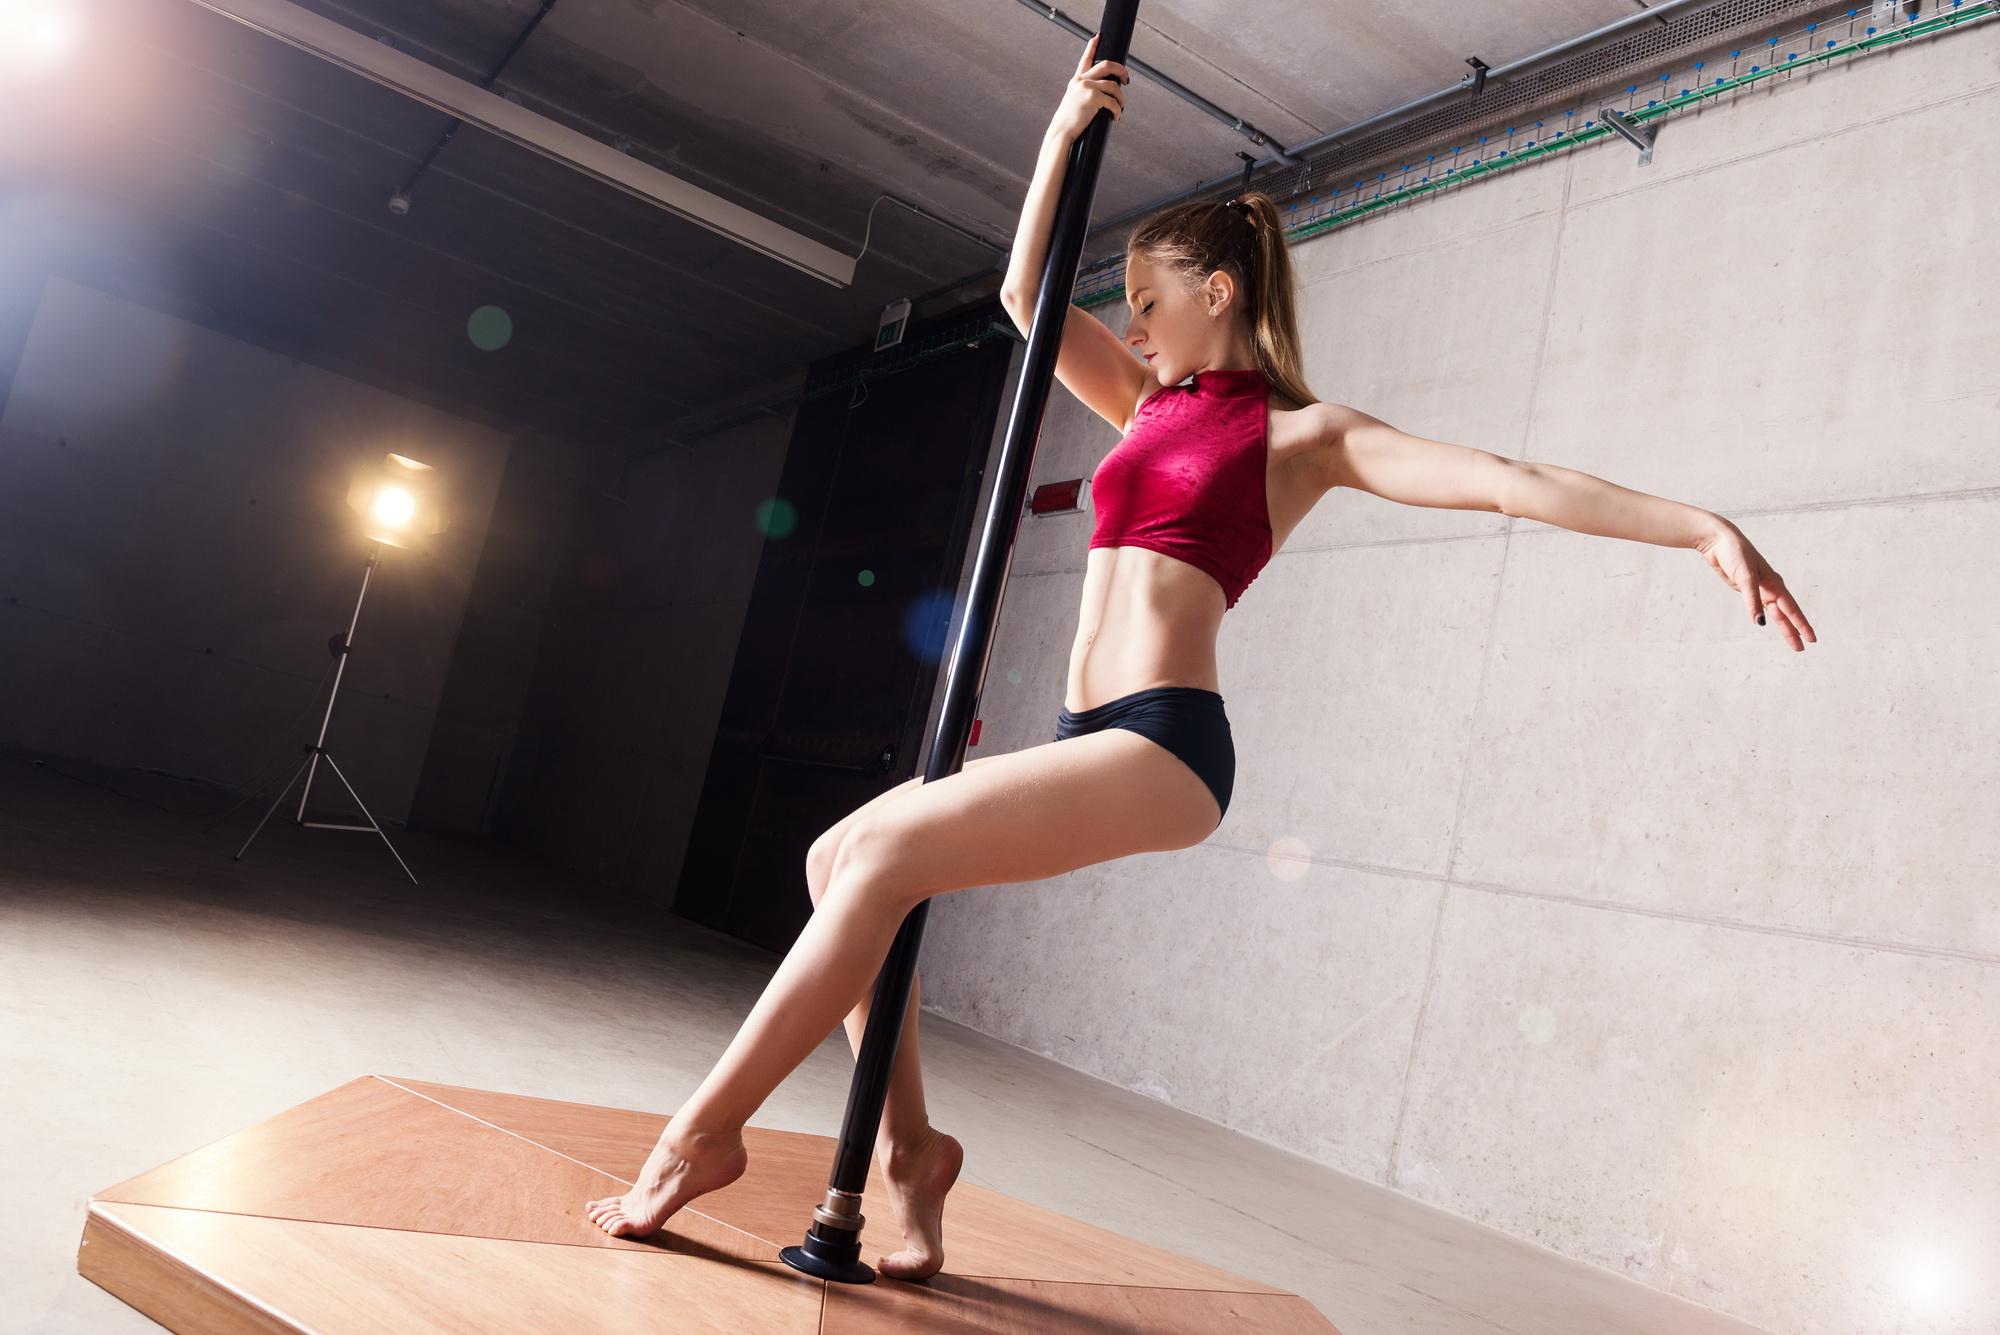 Czy pole dance pomaga schudnąć